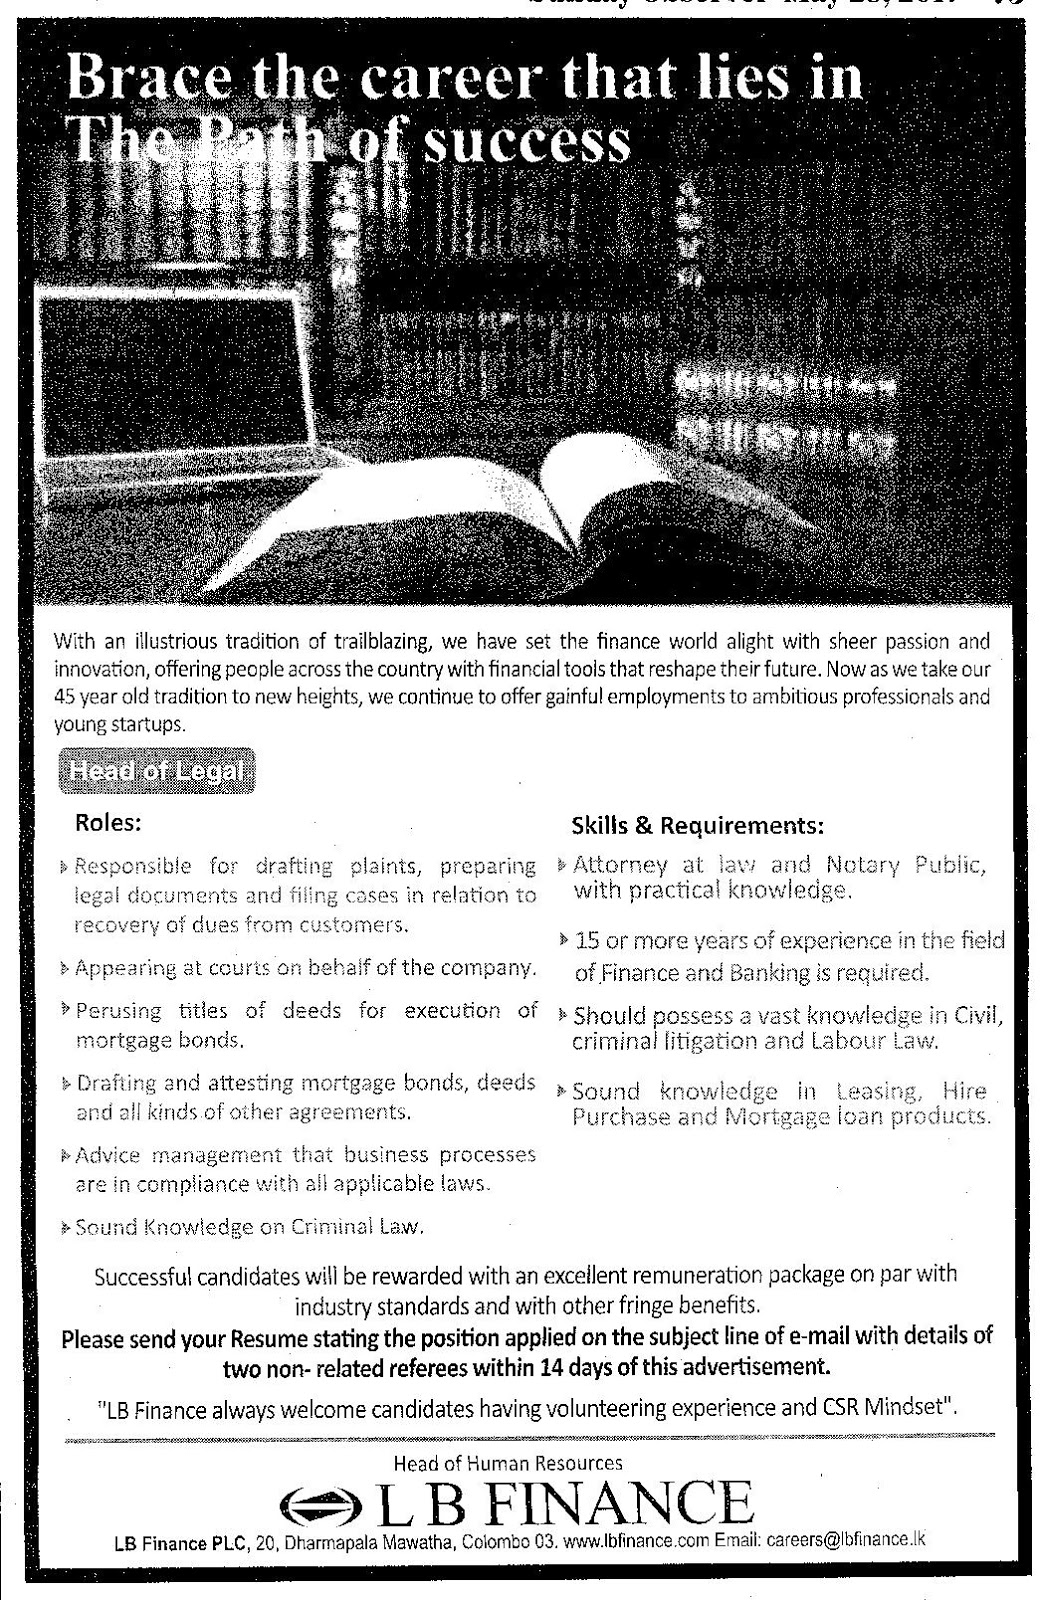 Head Of Legal Lb Finance Ceylonbook